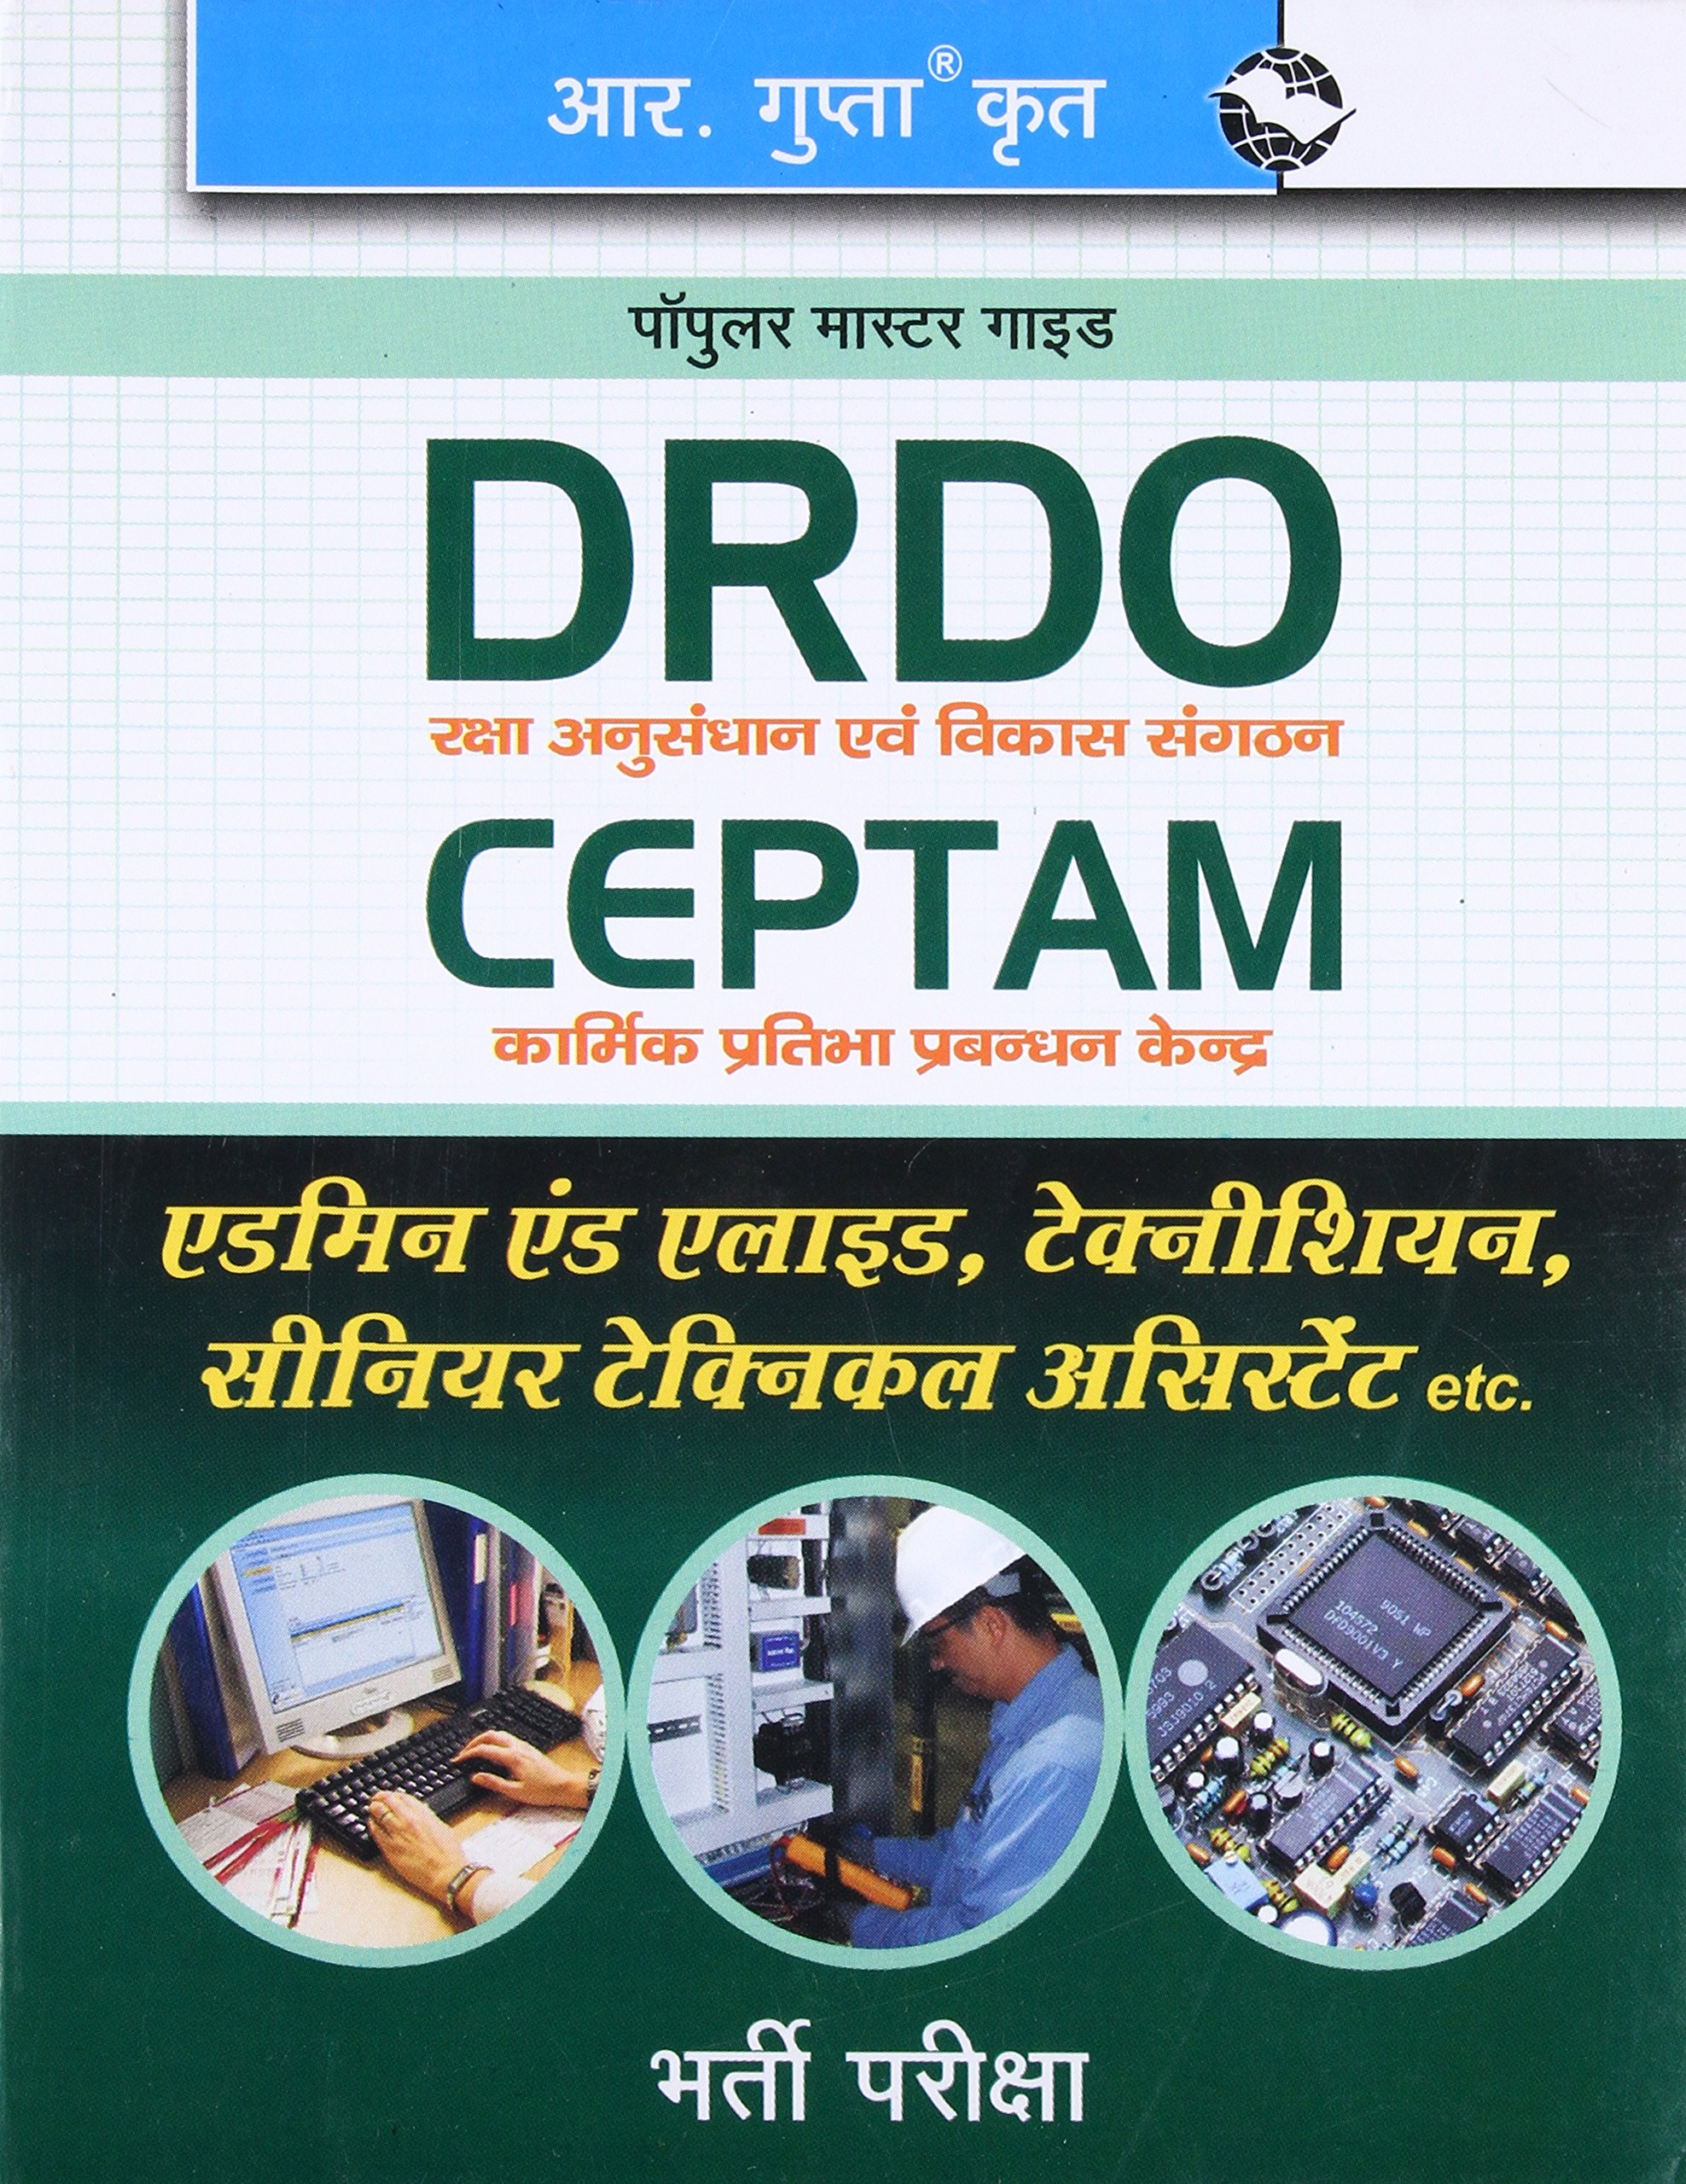 DRDO: CEPTAM Recruitment Exam Guide (Hindi) pdf